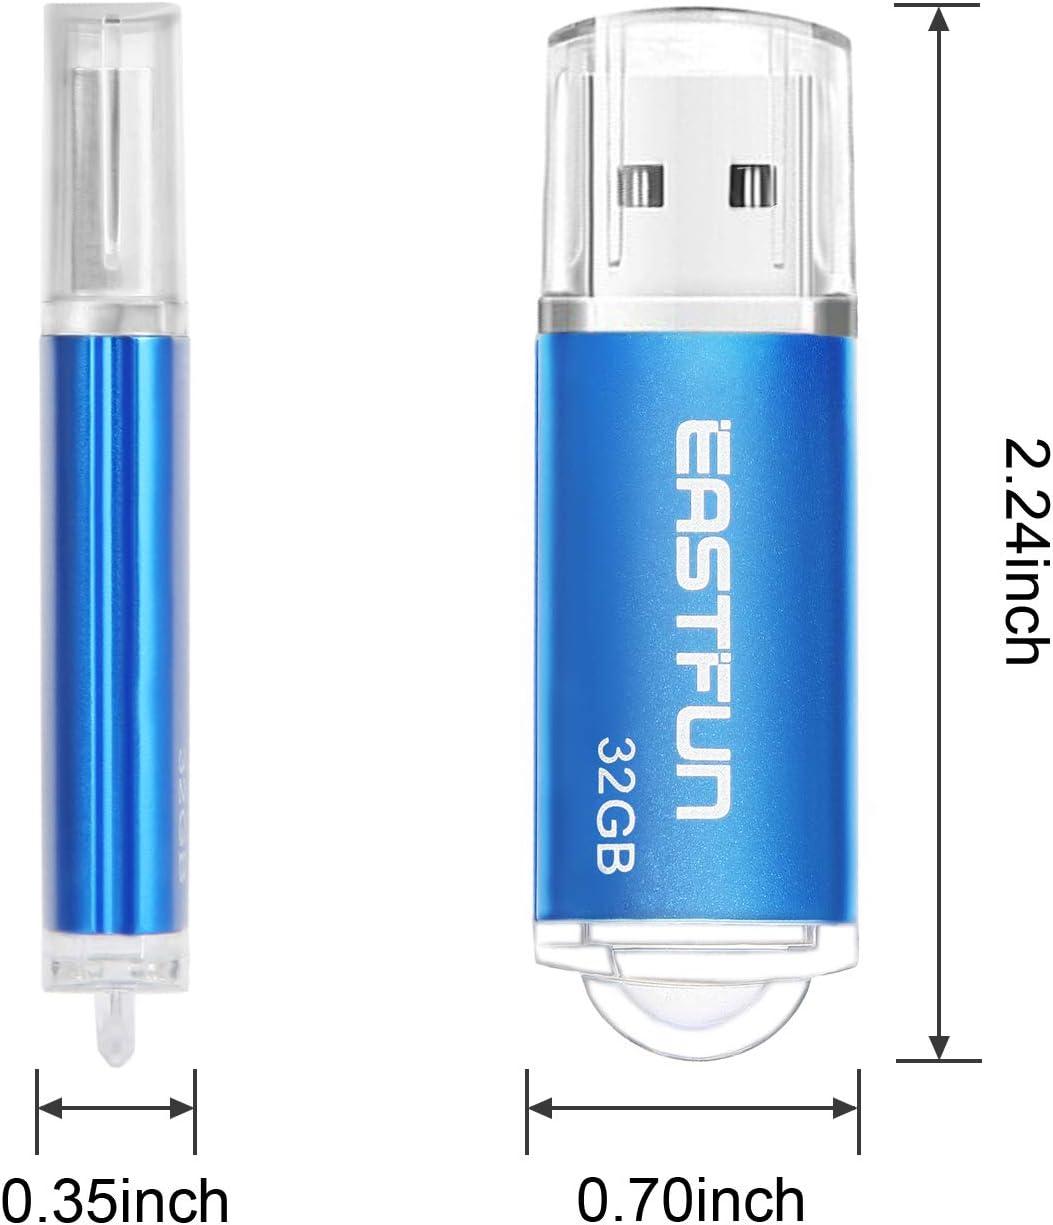 Gold Rose Blue Purple Green 5 x 32GB Colors 5 Pack EASTFUN 32GB USB 2.0 Flash Drive Memory Stick Thumb Drive Pen Drive Jump Drive Zip Drive